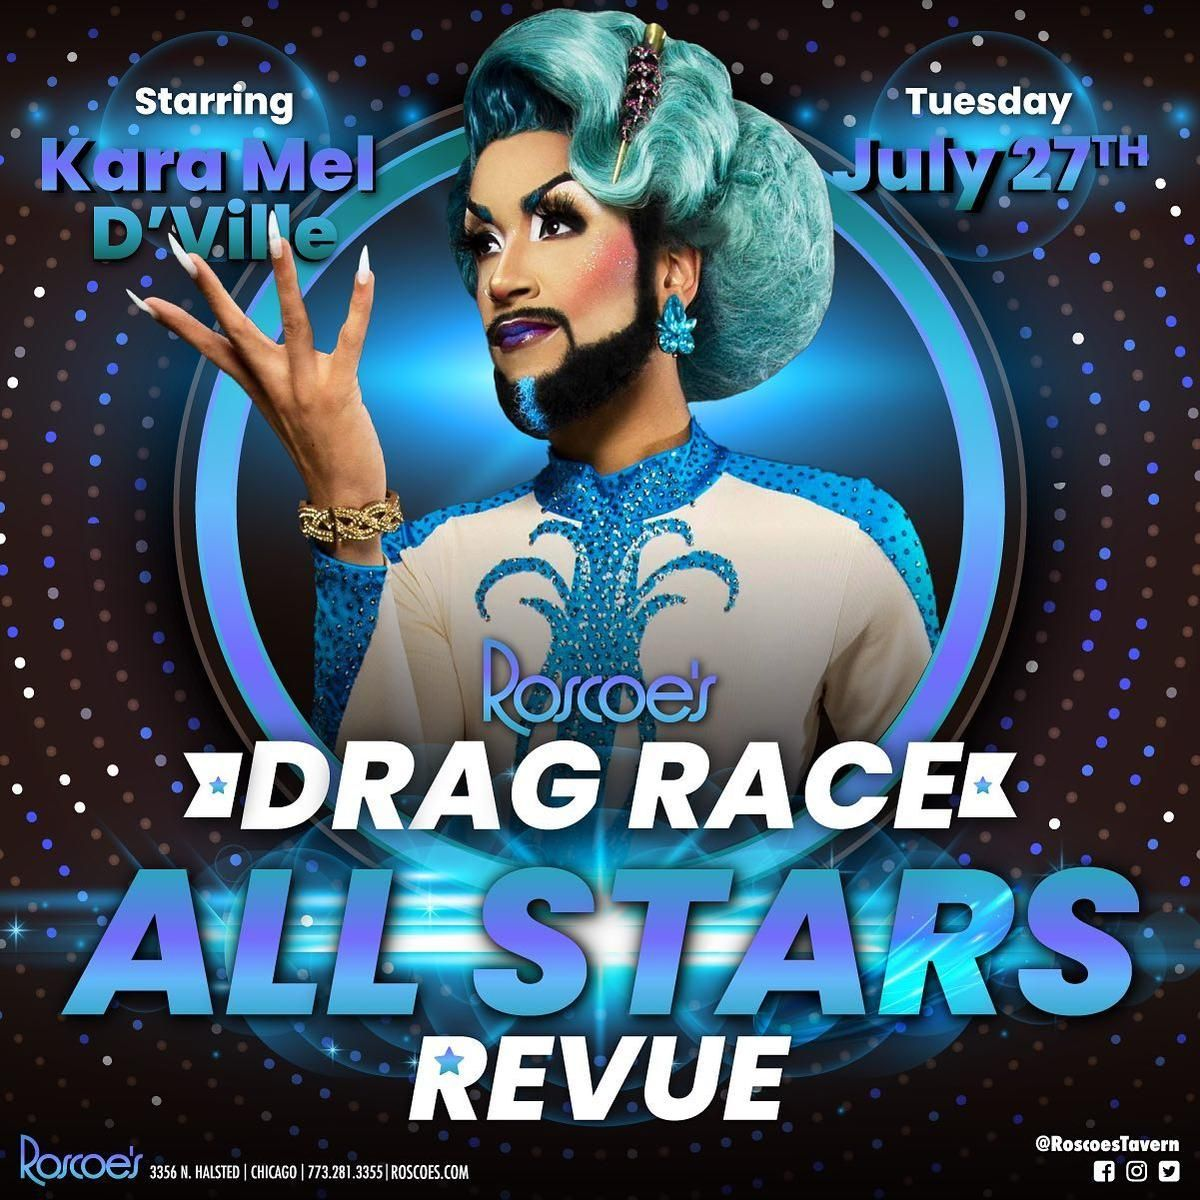 Drag Race All Star Revue